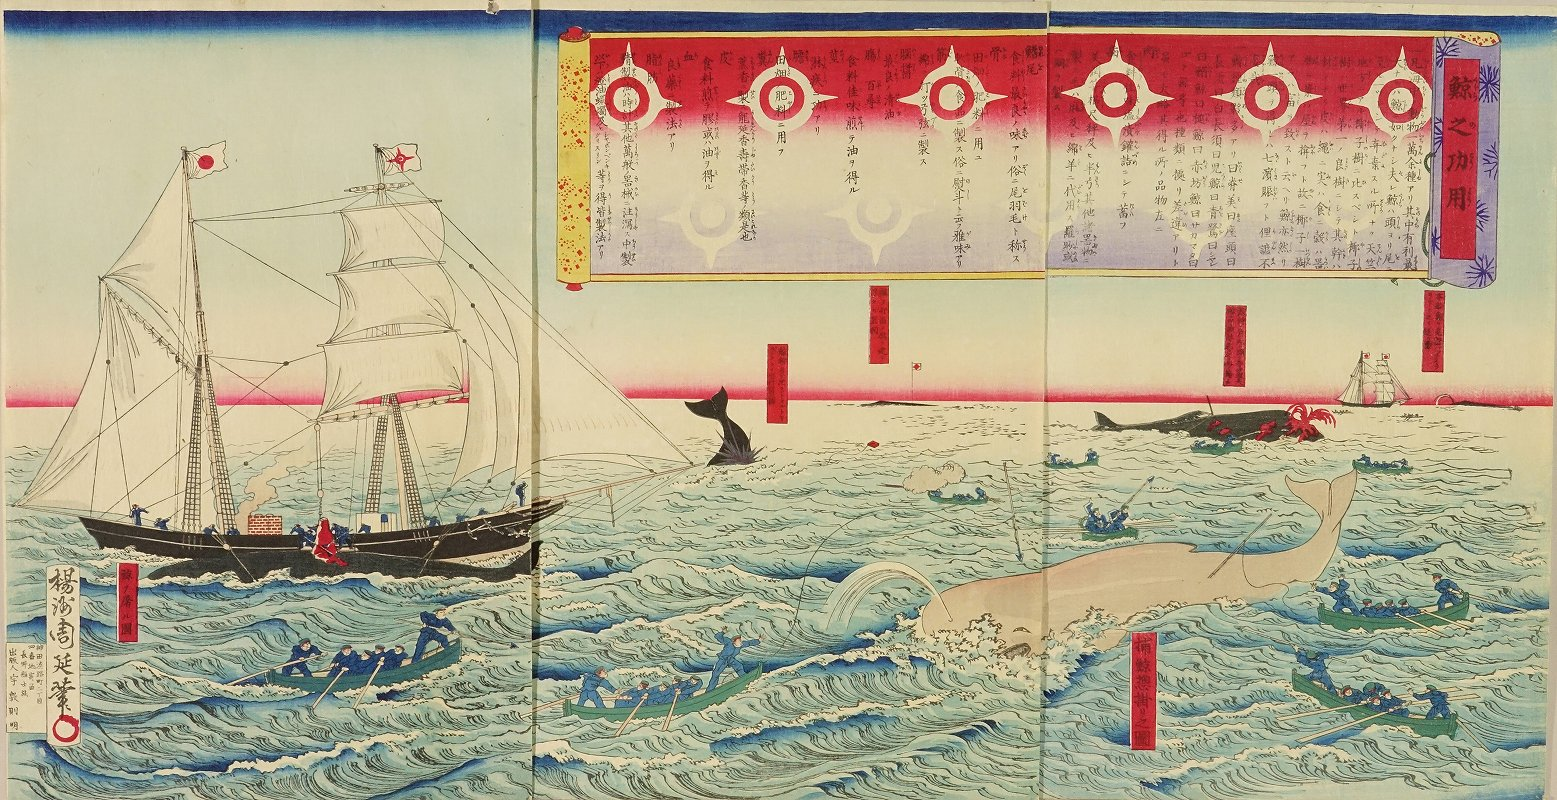 CHIKANOBU <i>Kujira no koyo</i> (Use of whale), triptych